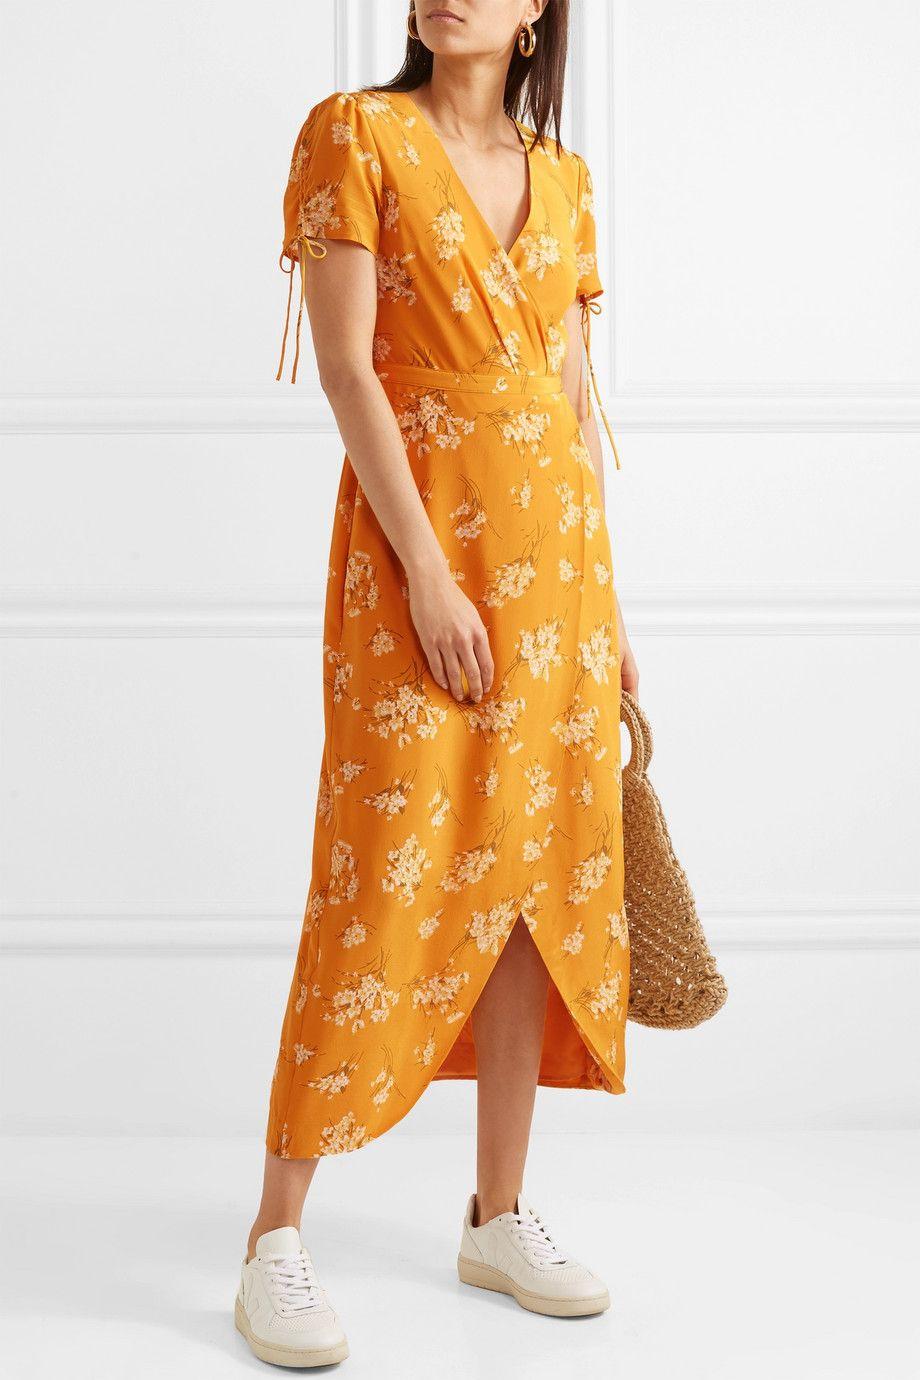 Madewell Wrap Effect Floral Print Silk Midi Dress Net A Porter Com Silk Midi Dress Floral Dress Formal Madewell Dresses [ 1380 x 920 Pixel ]